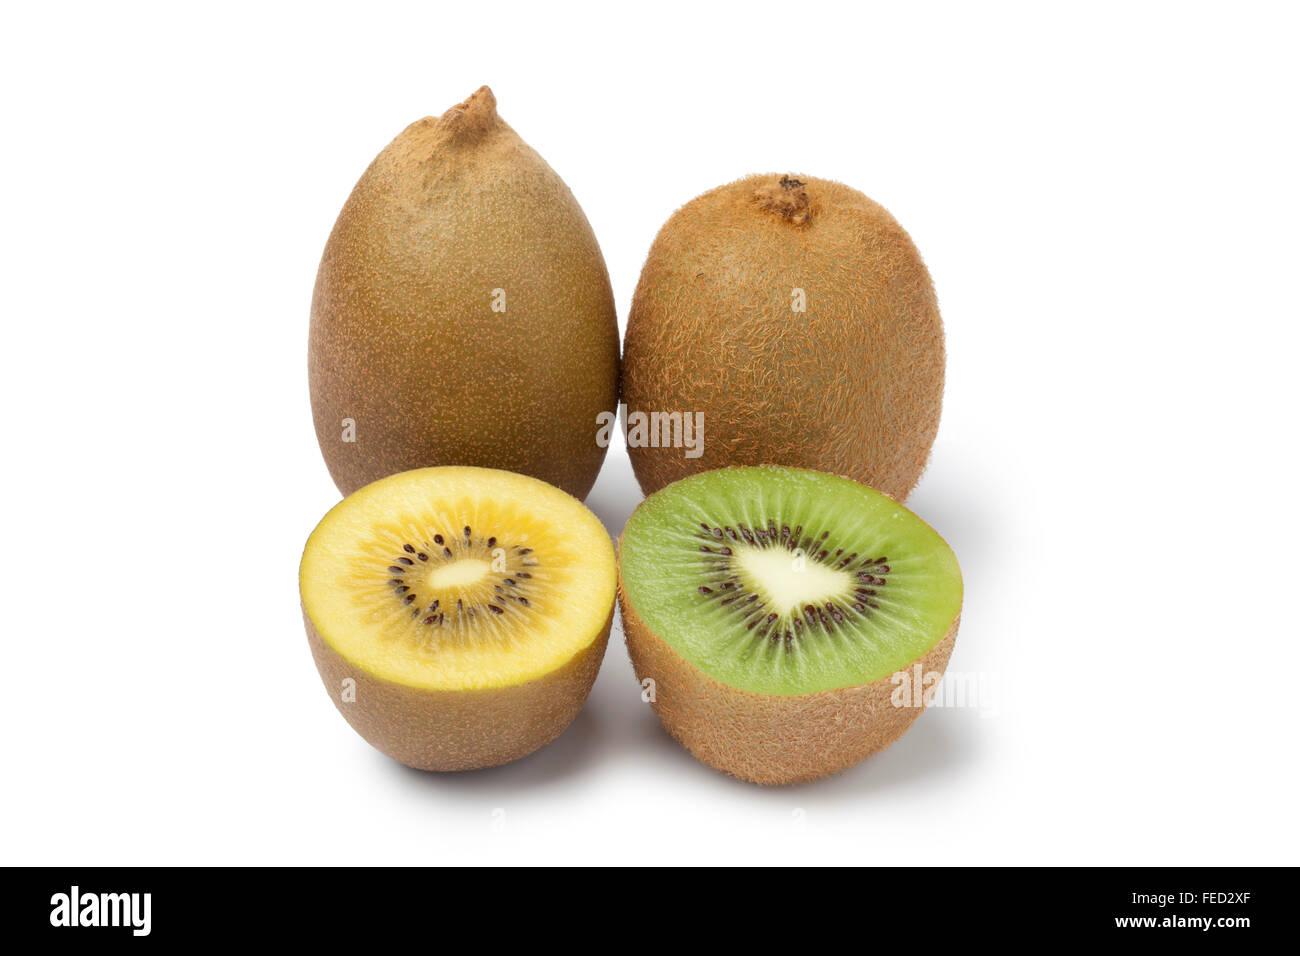 Fresh yellow and green kiwi fruit on white background - Stock Image